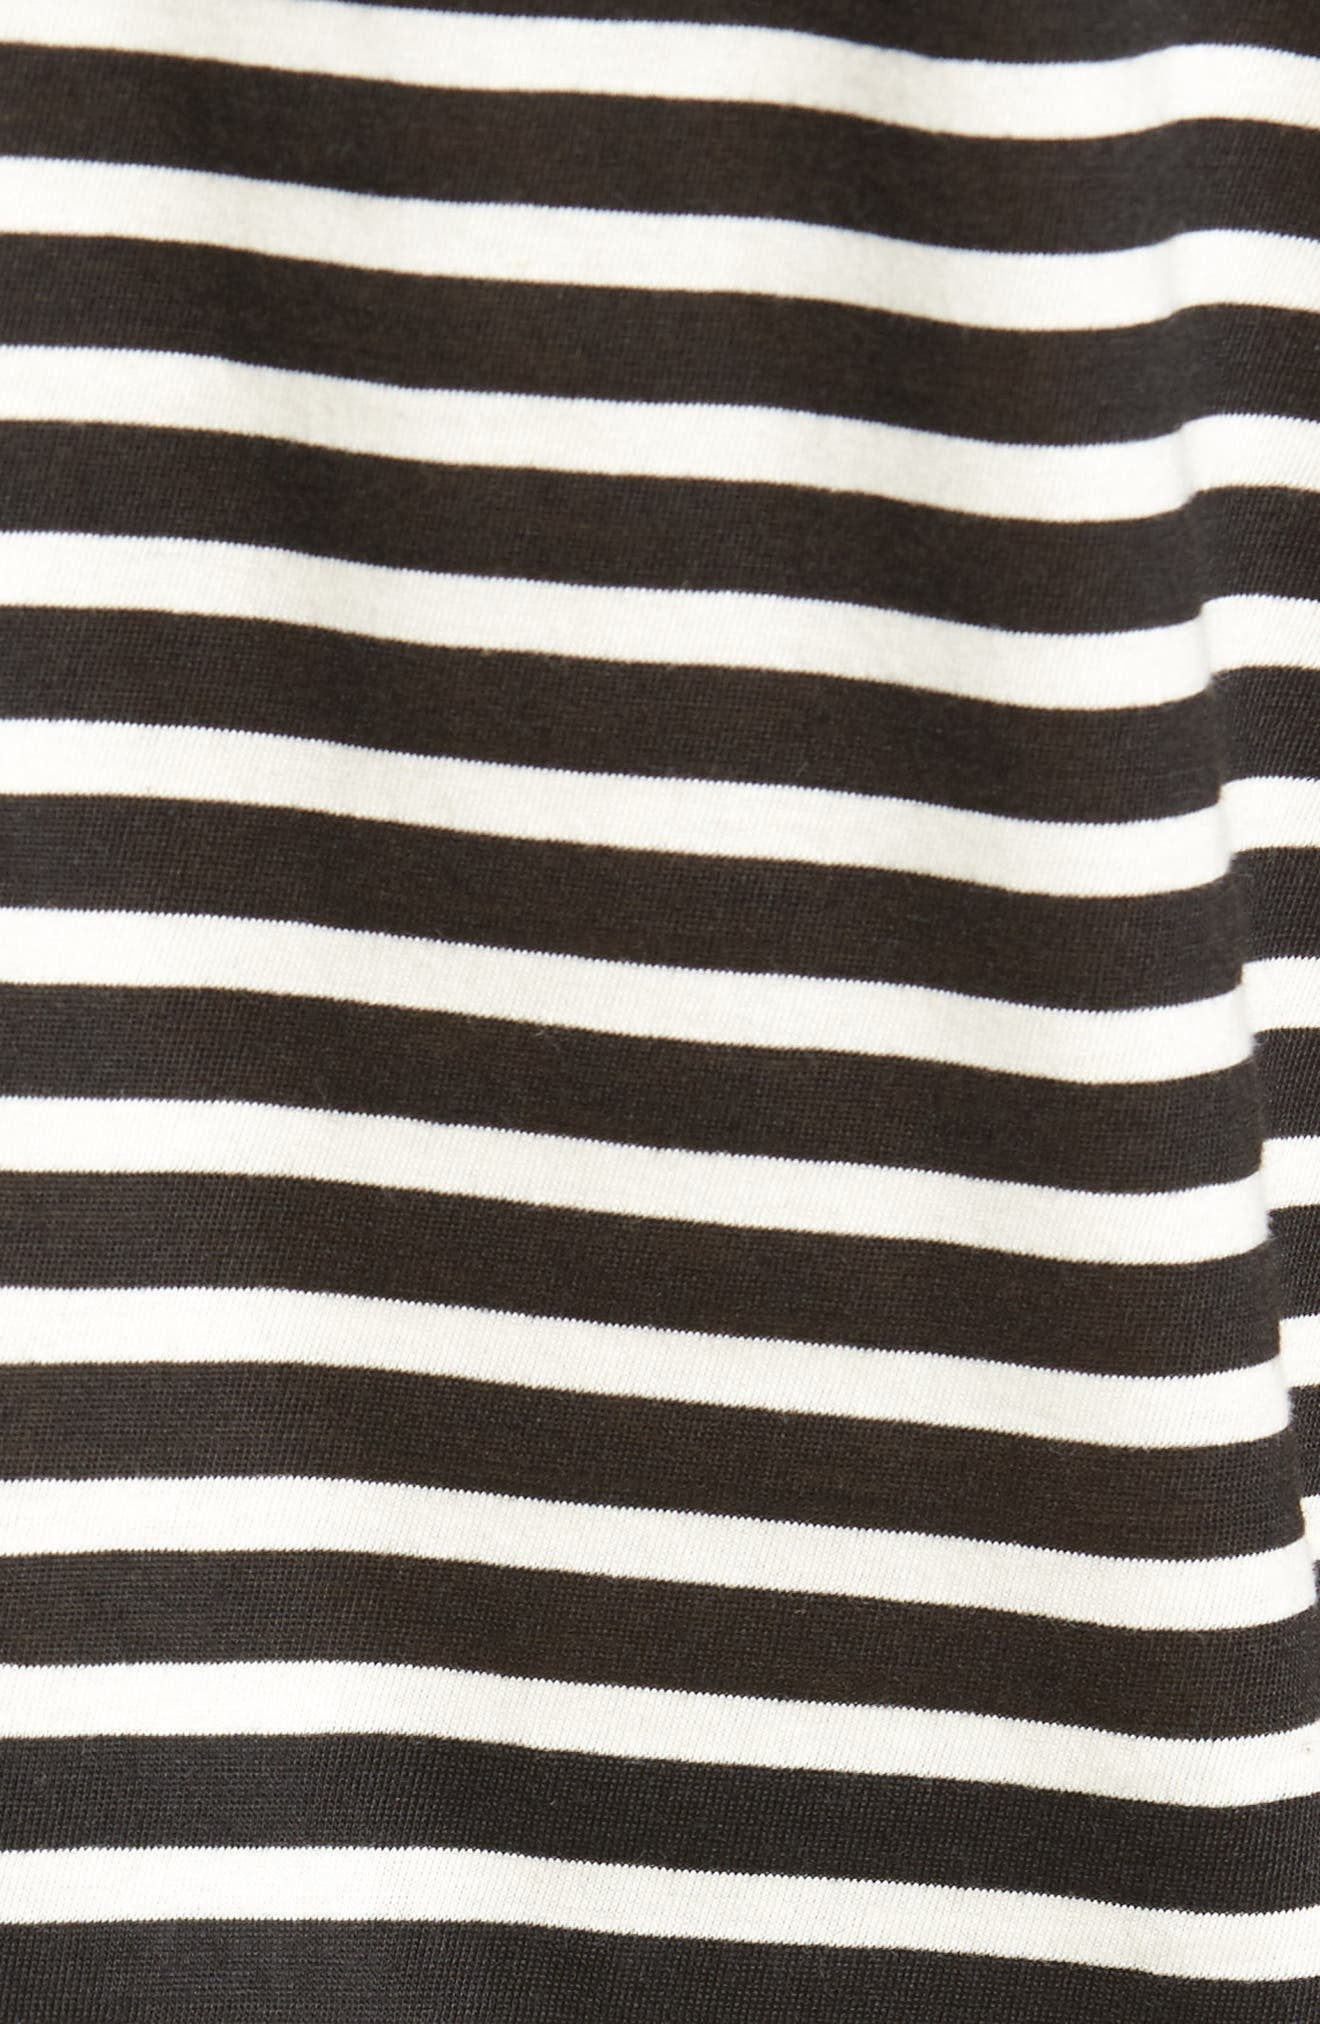 Spliced Stripe T-Shirt,                             Alternate thumbnail 5, color,                             Black Rock- White Stripe